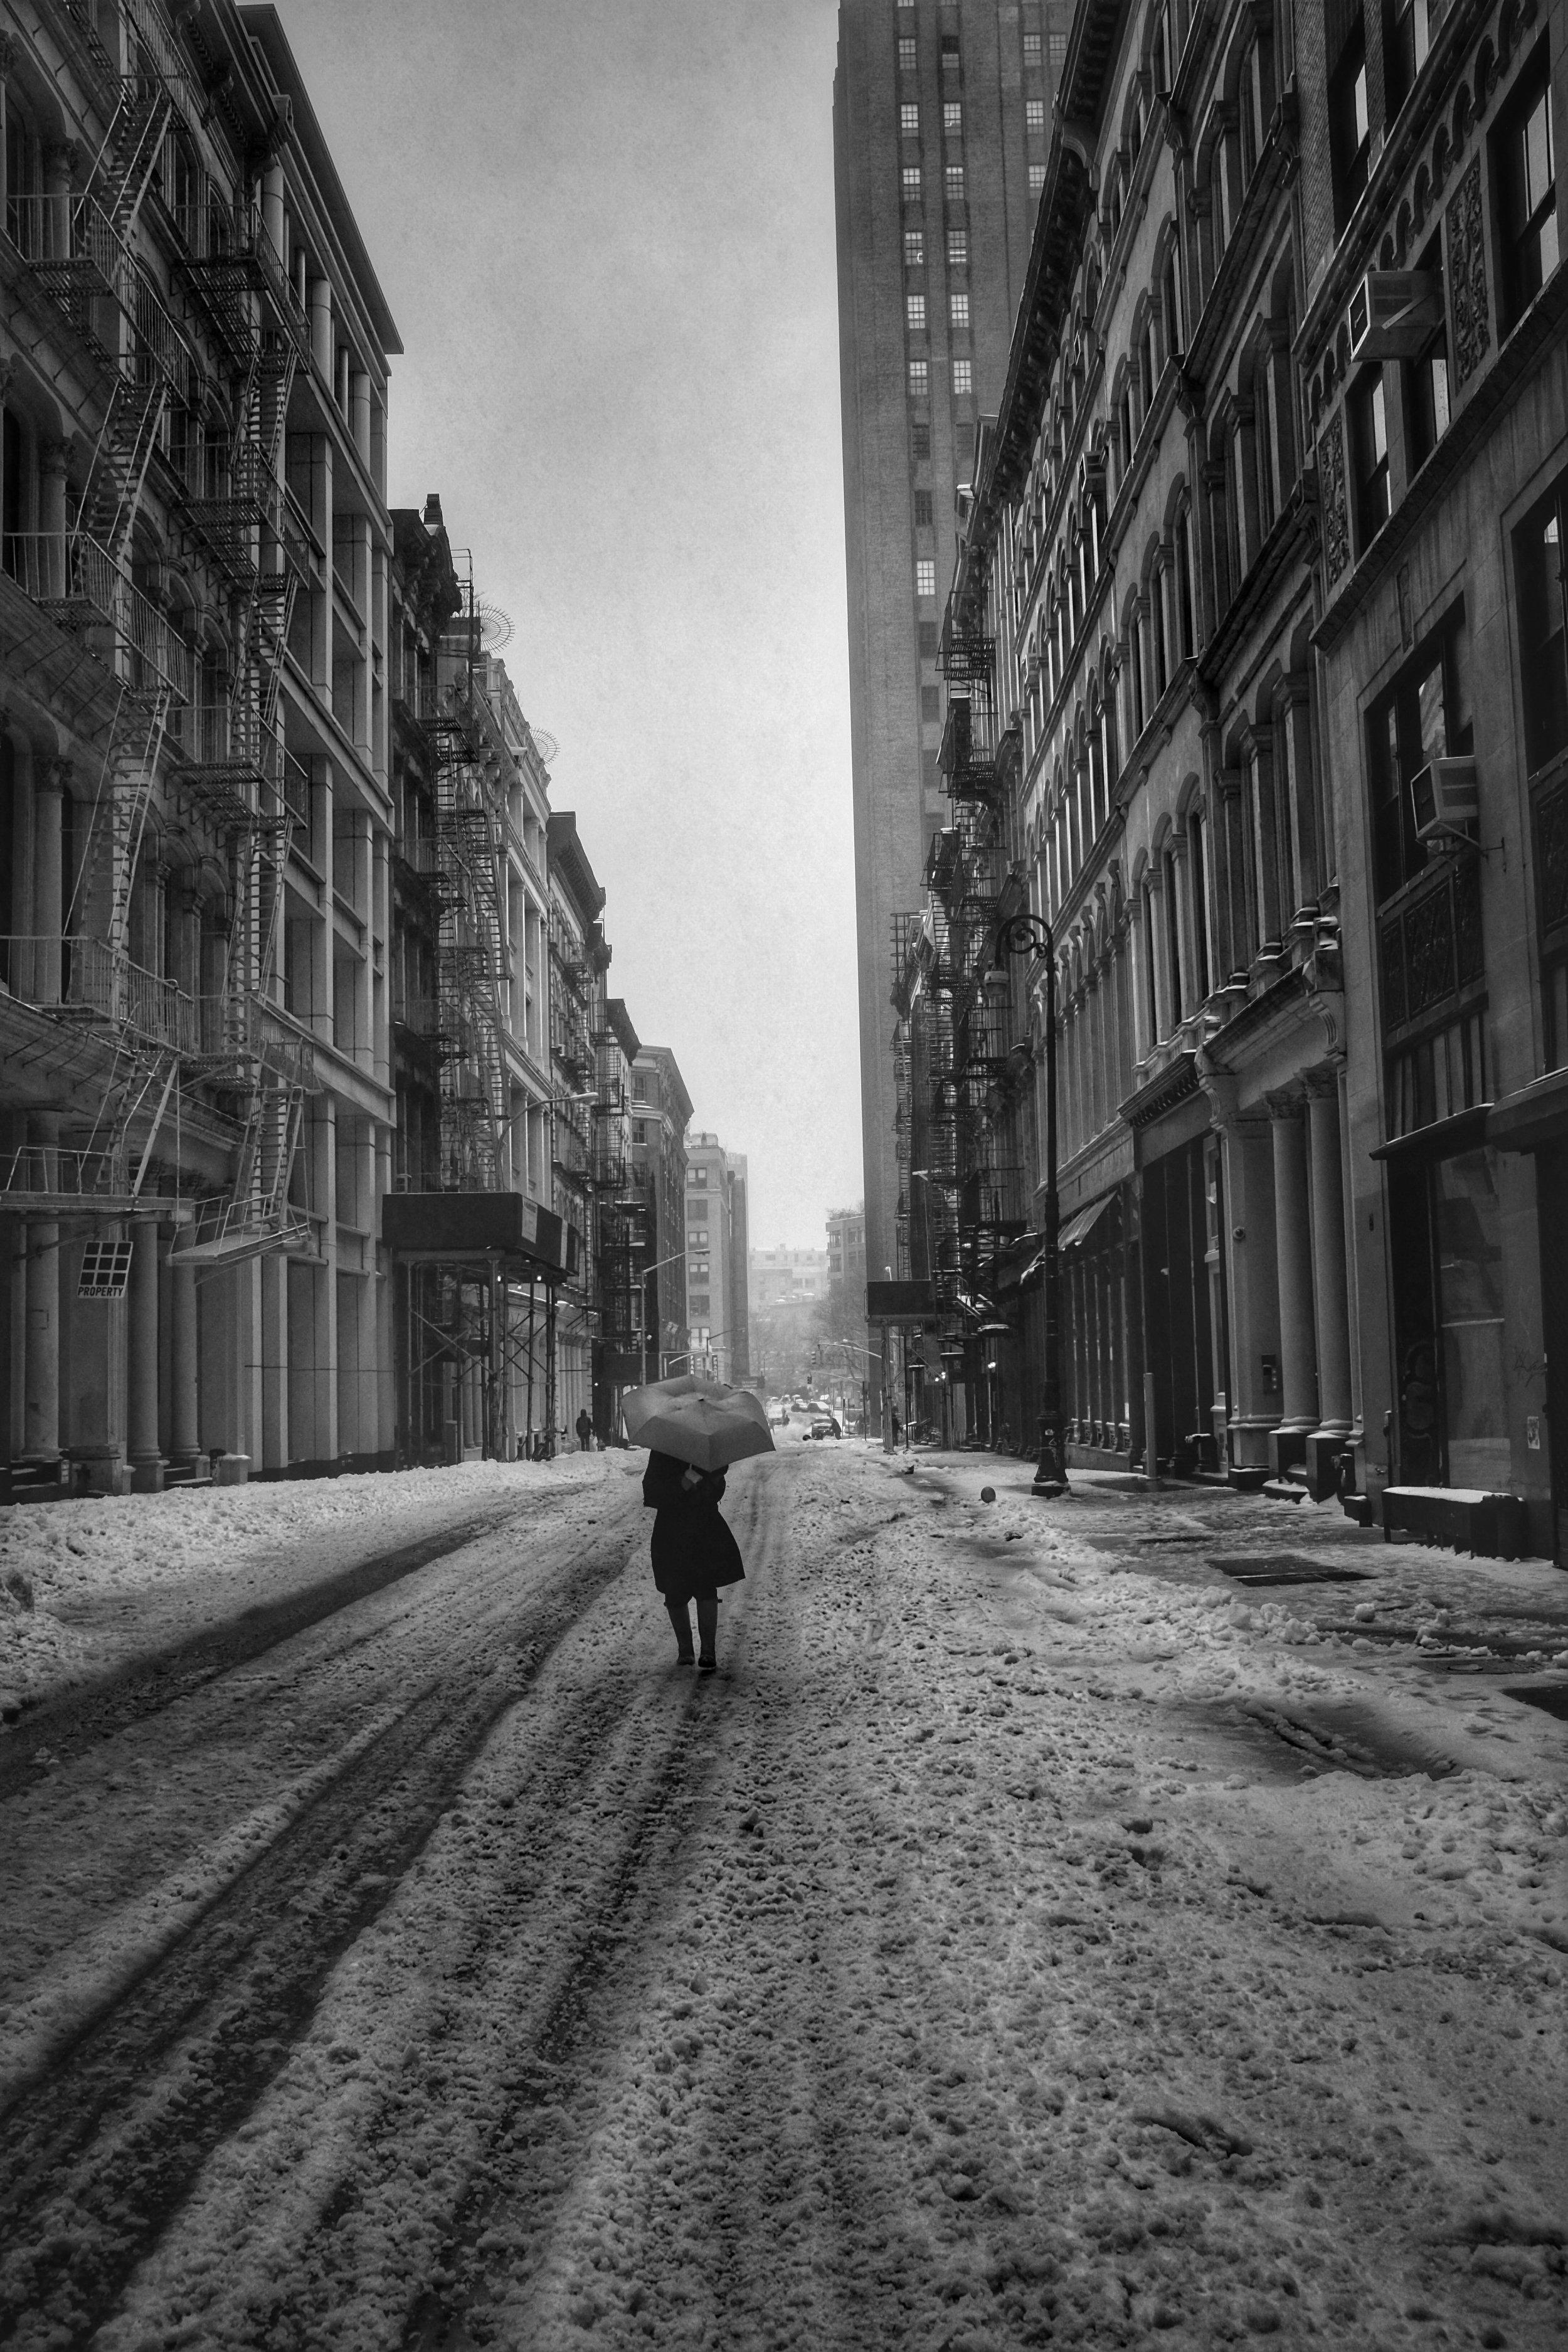 Walker Street. TriBeCa. New York City. 2017.